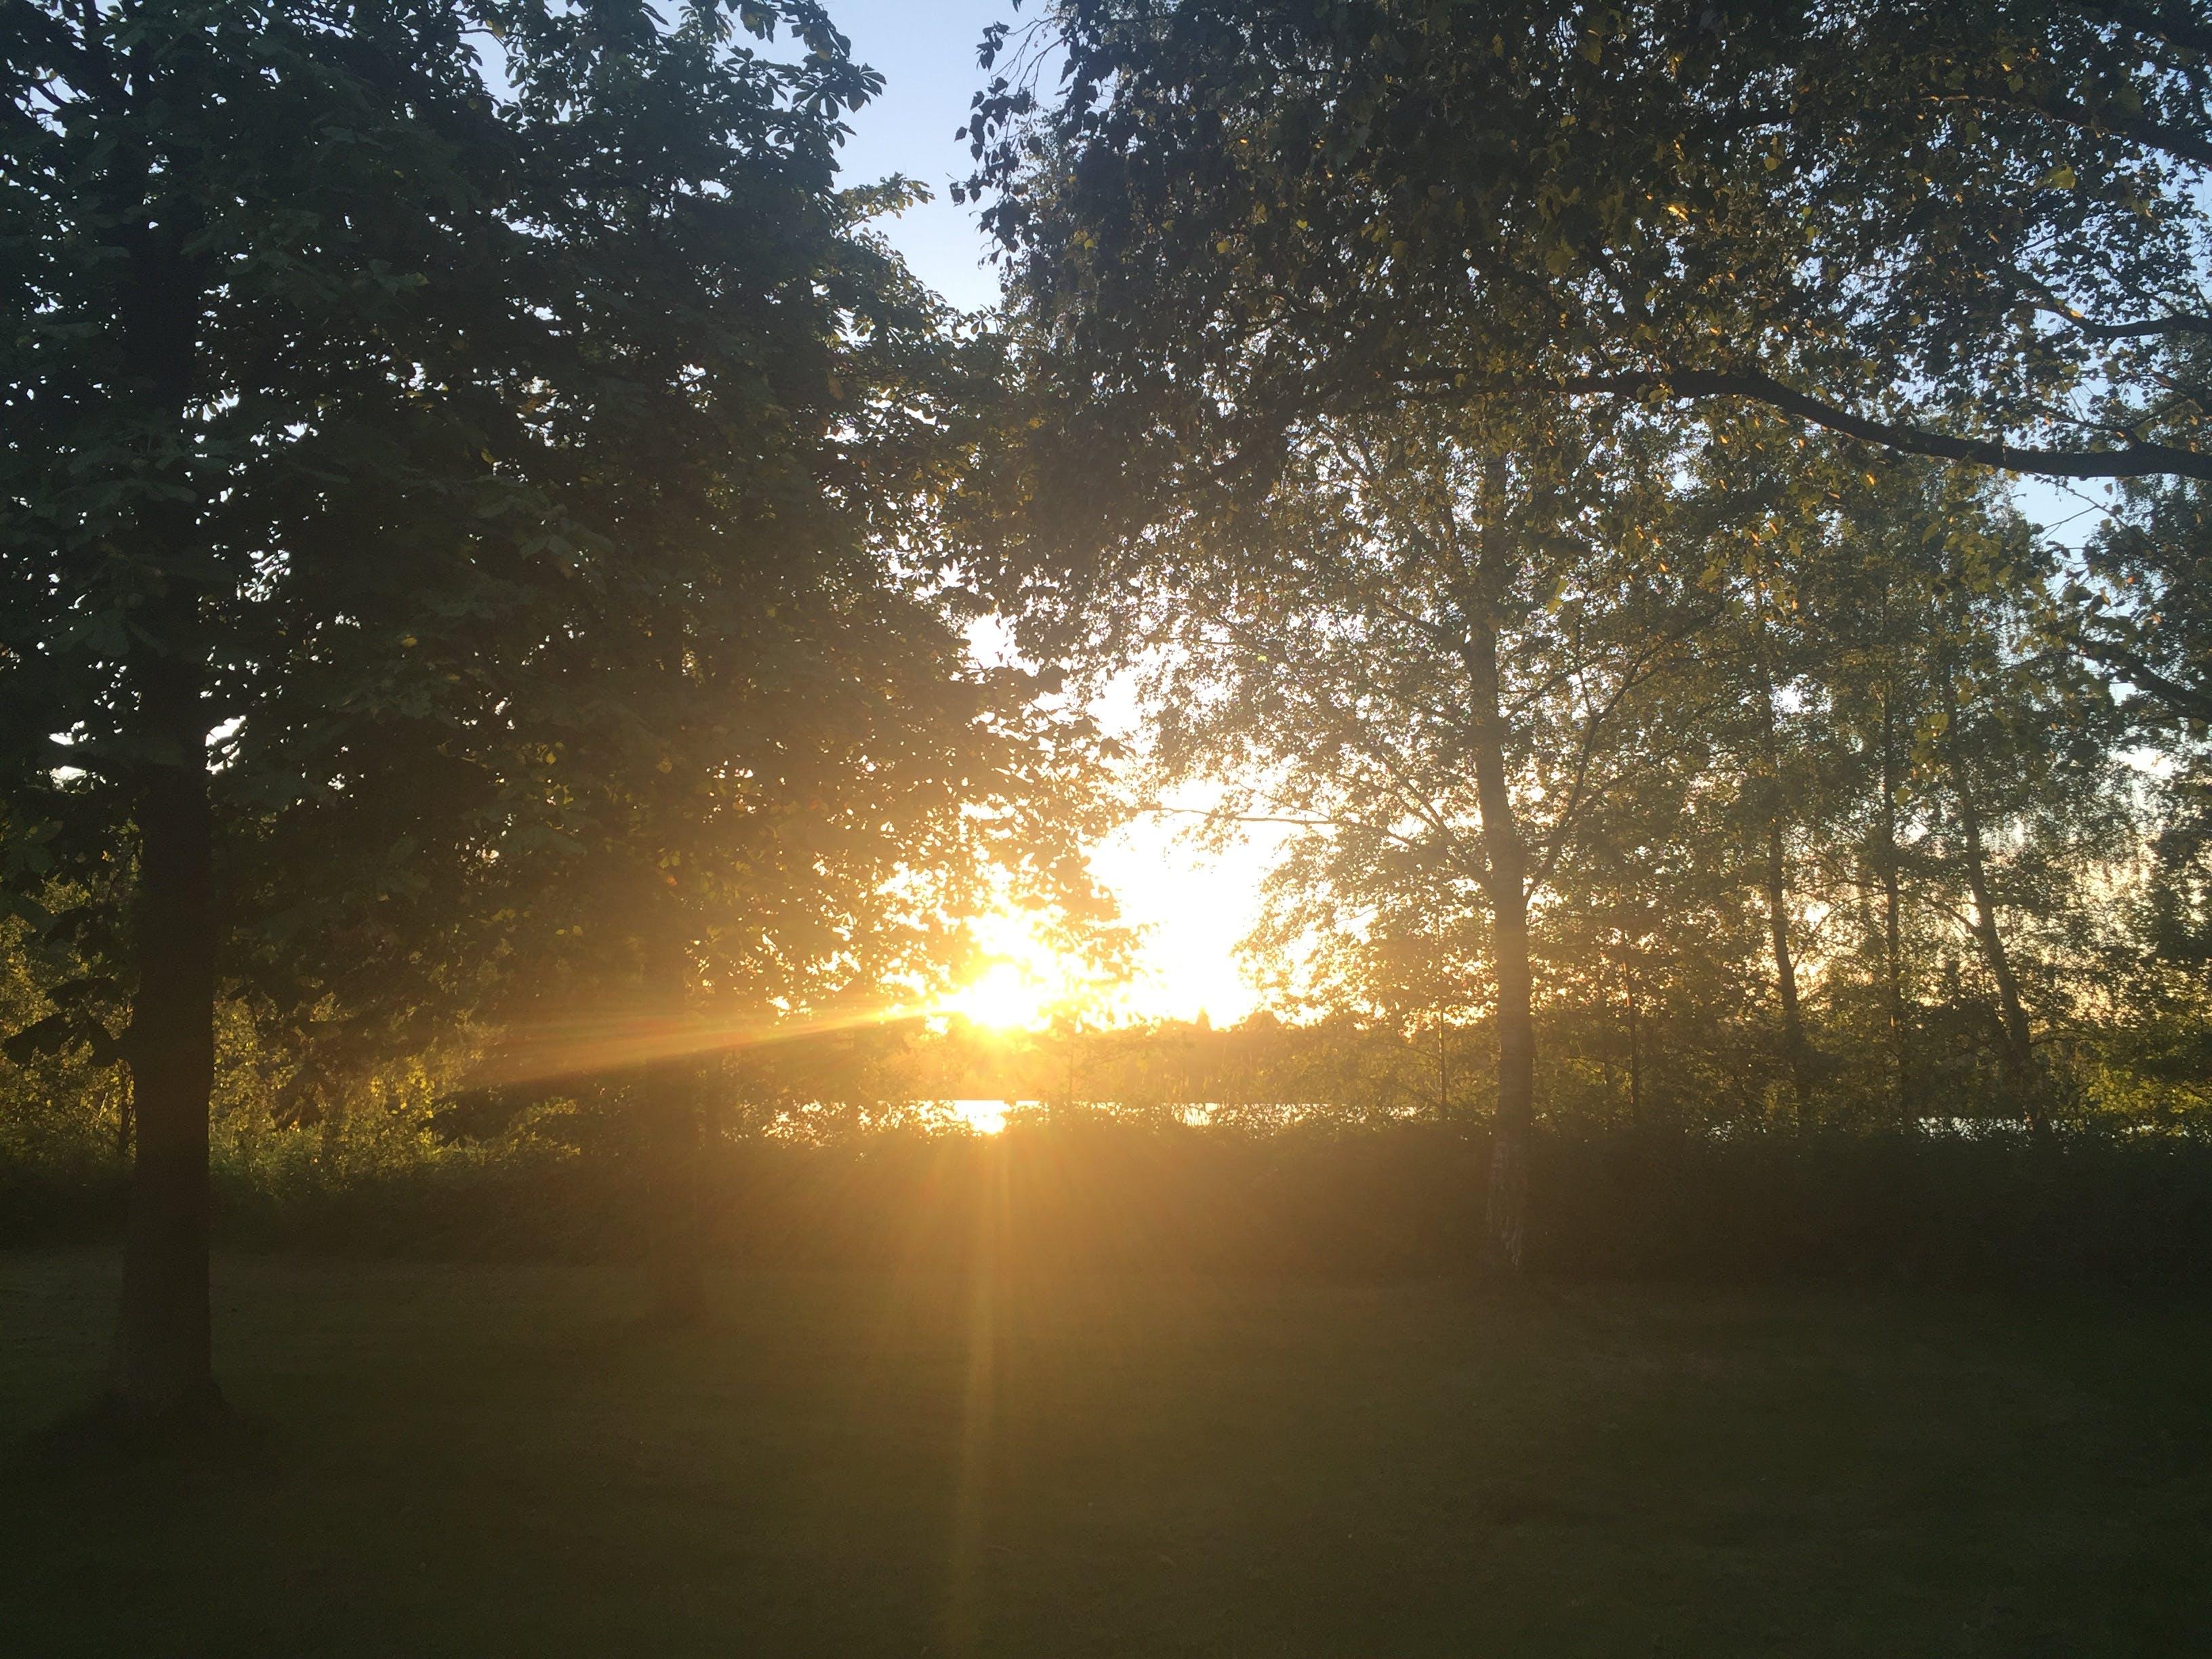 Kostenloses Stock Foto zu bäume, frieden, himmel, liebe